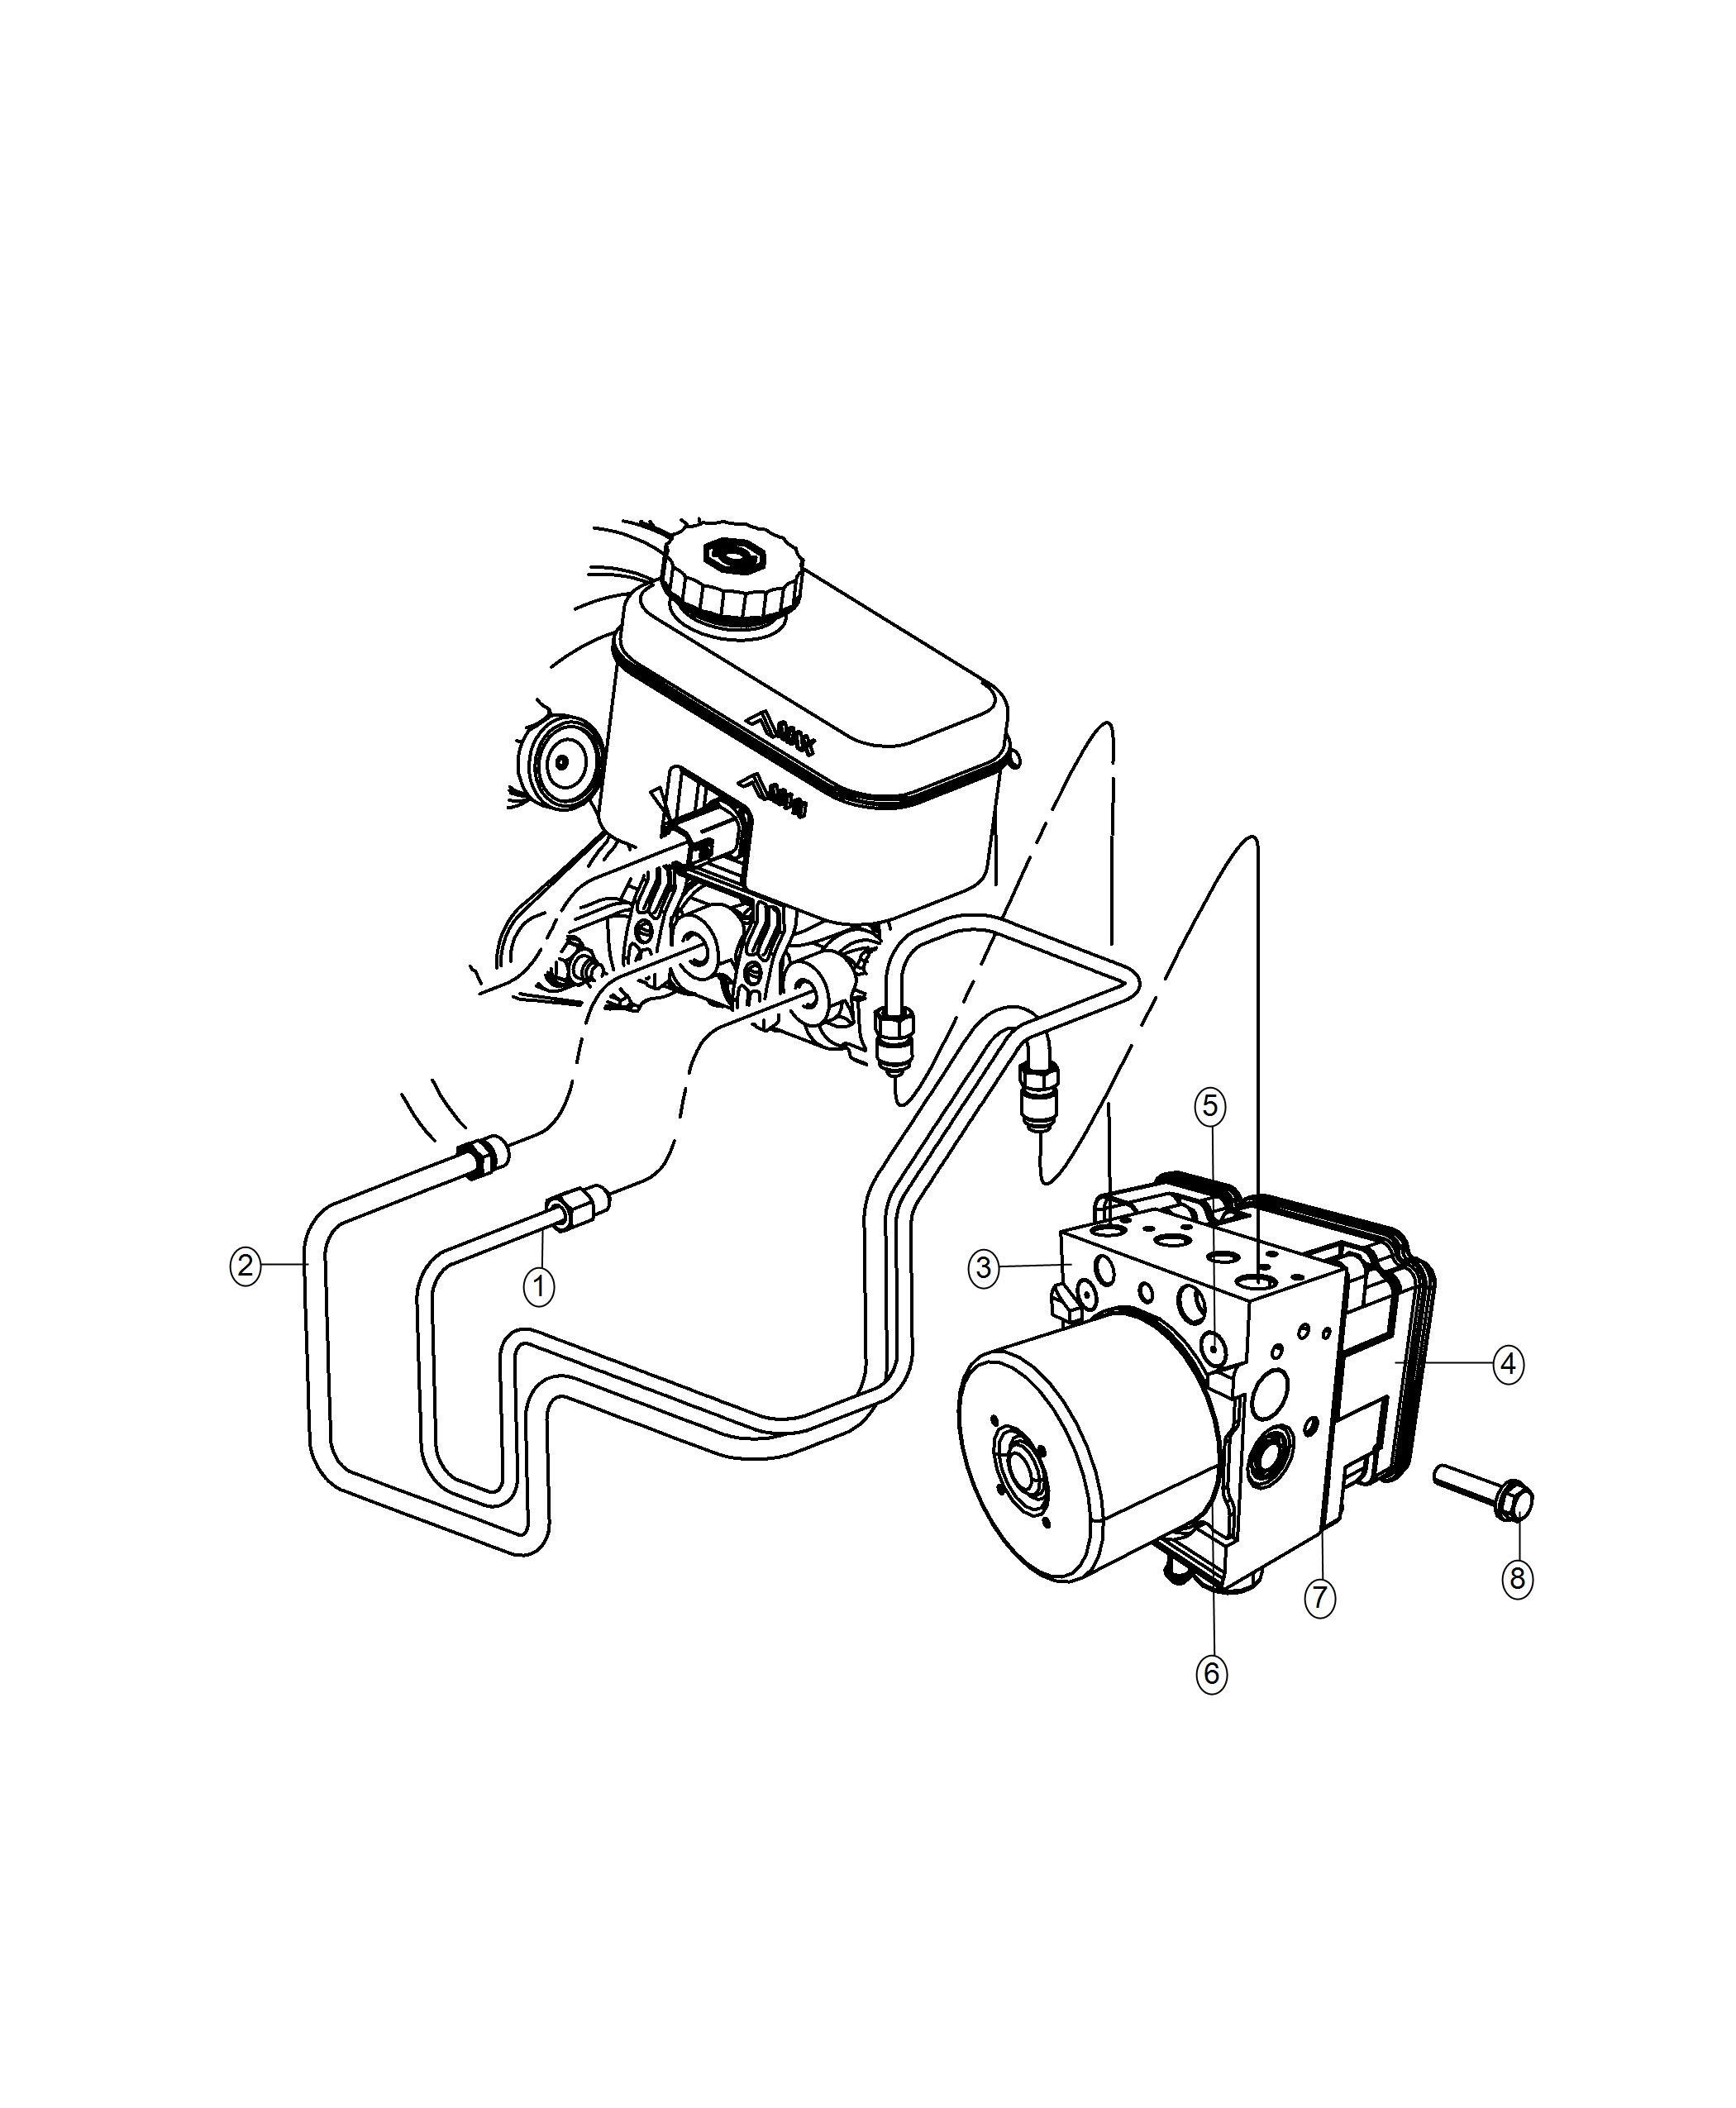 Jeep Wrangler Module Anti Lock Brake System